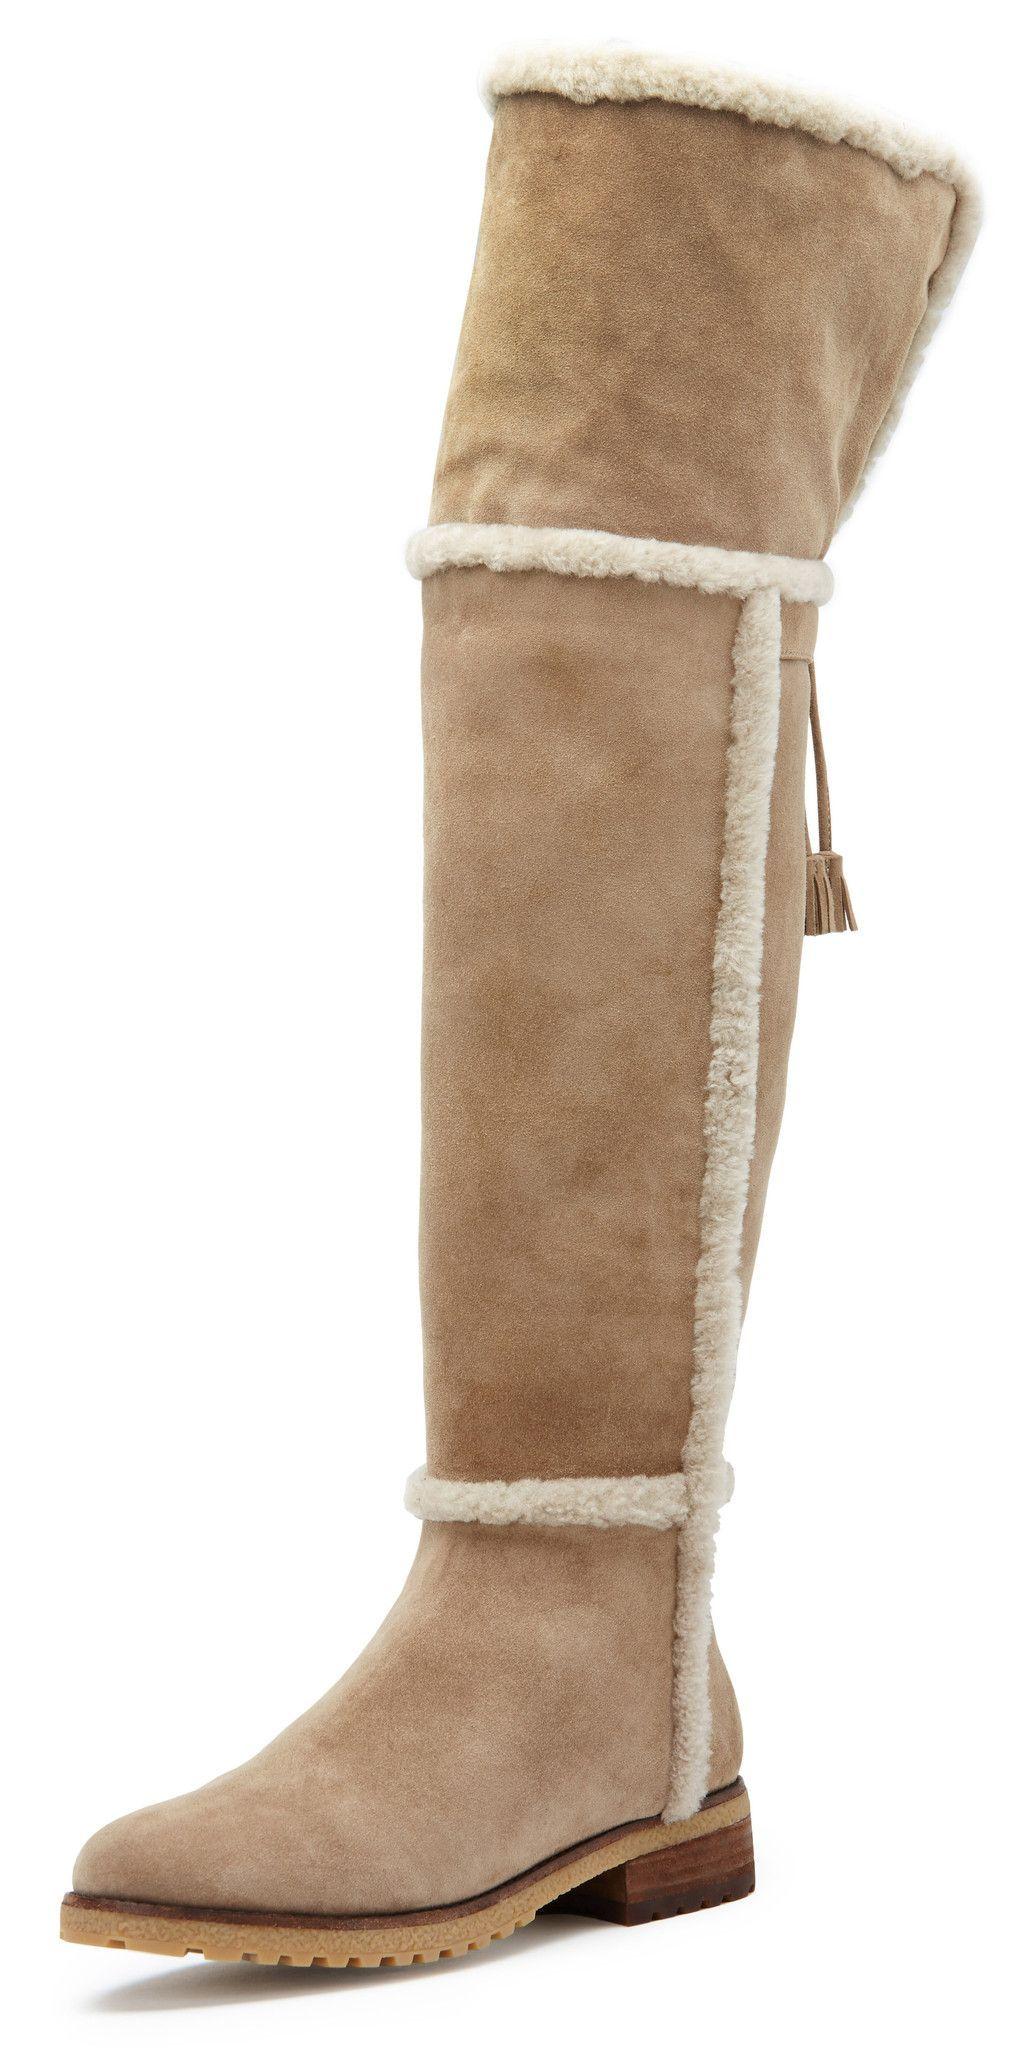 Frye - Tamara Over the Knee Boot